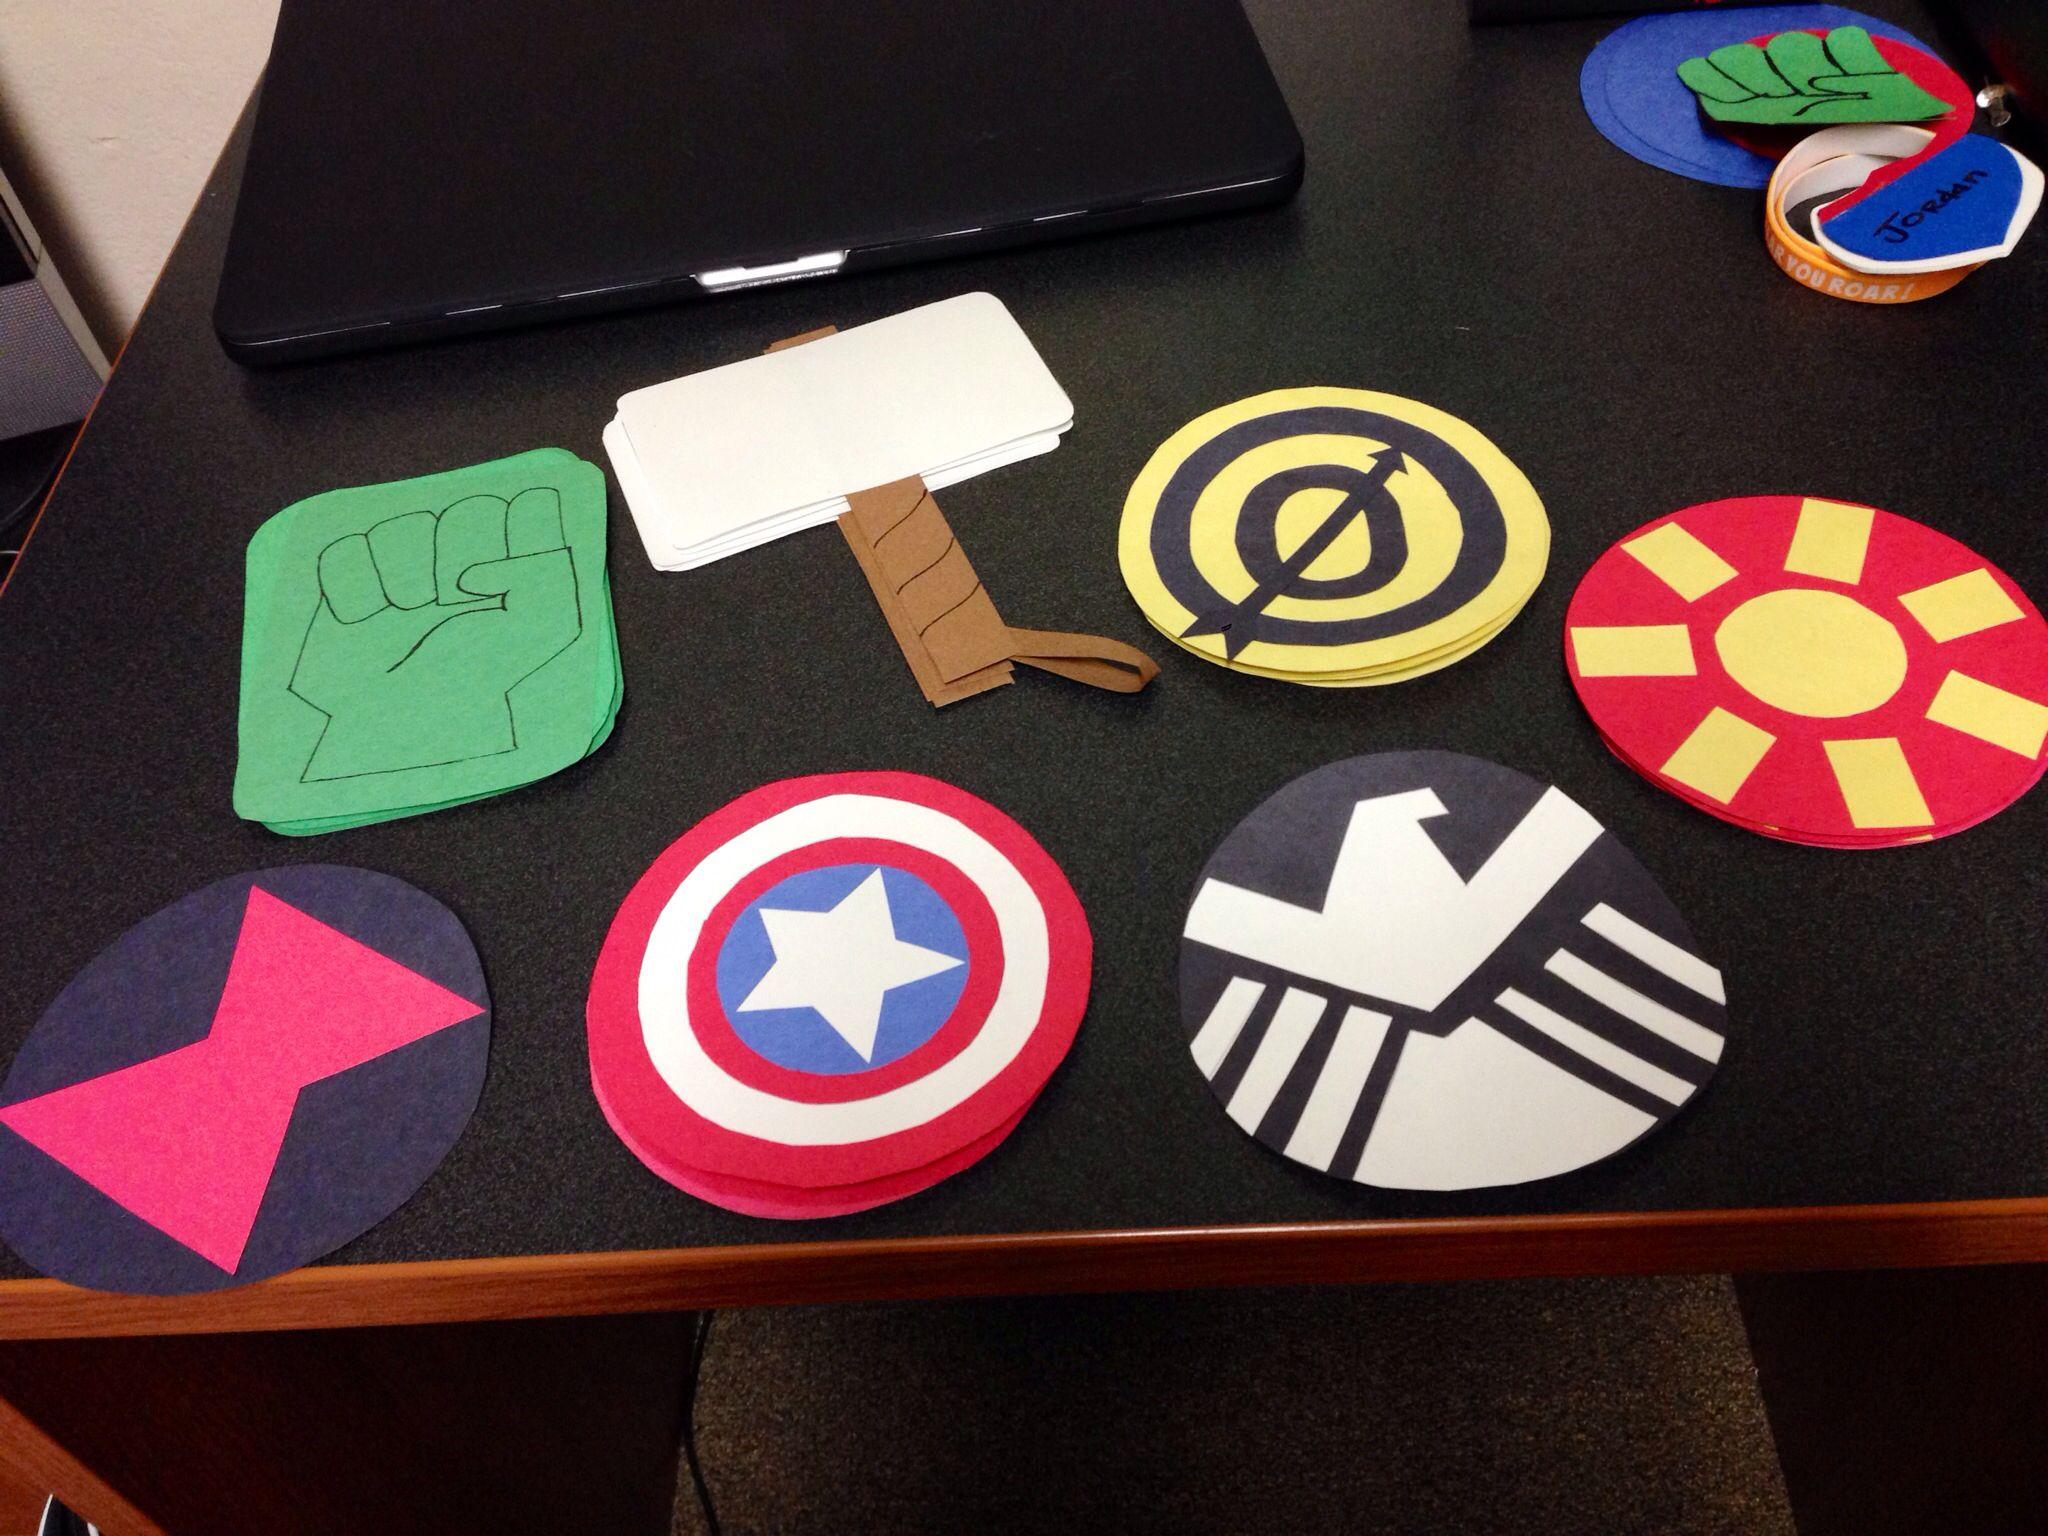 The Avengers Door Decs Theavengers Ra Doordecs Dorm Decorationsra